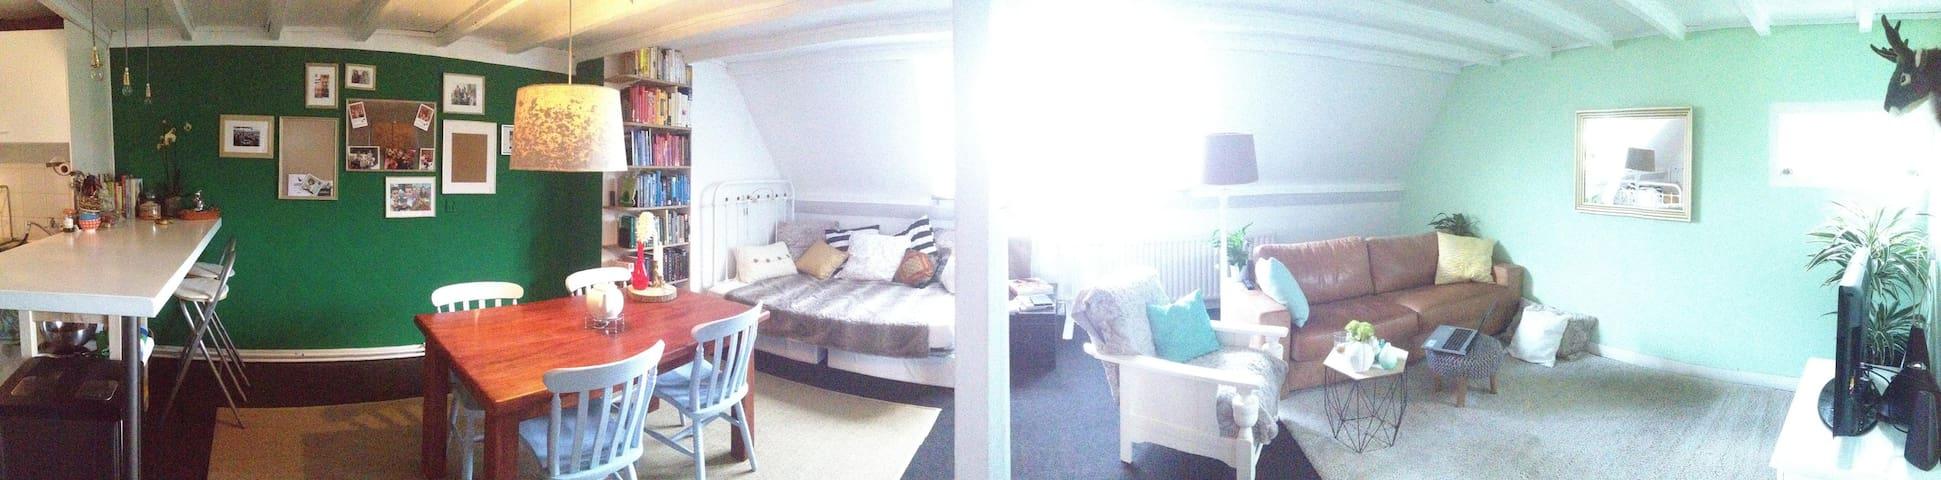 Spacious apartment with bikes - Breda - Appartement